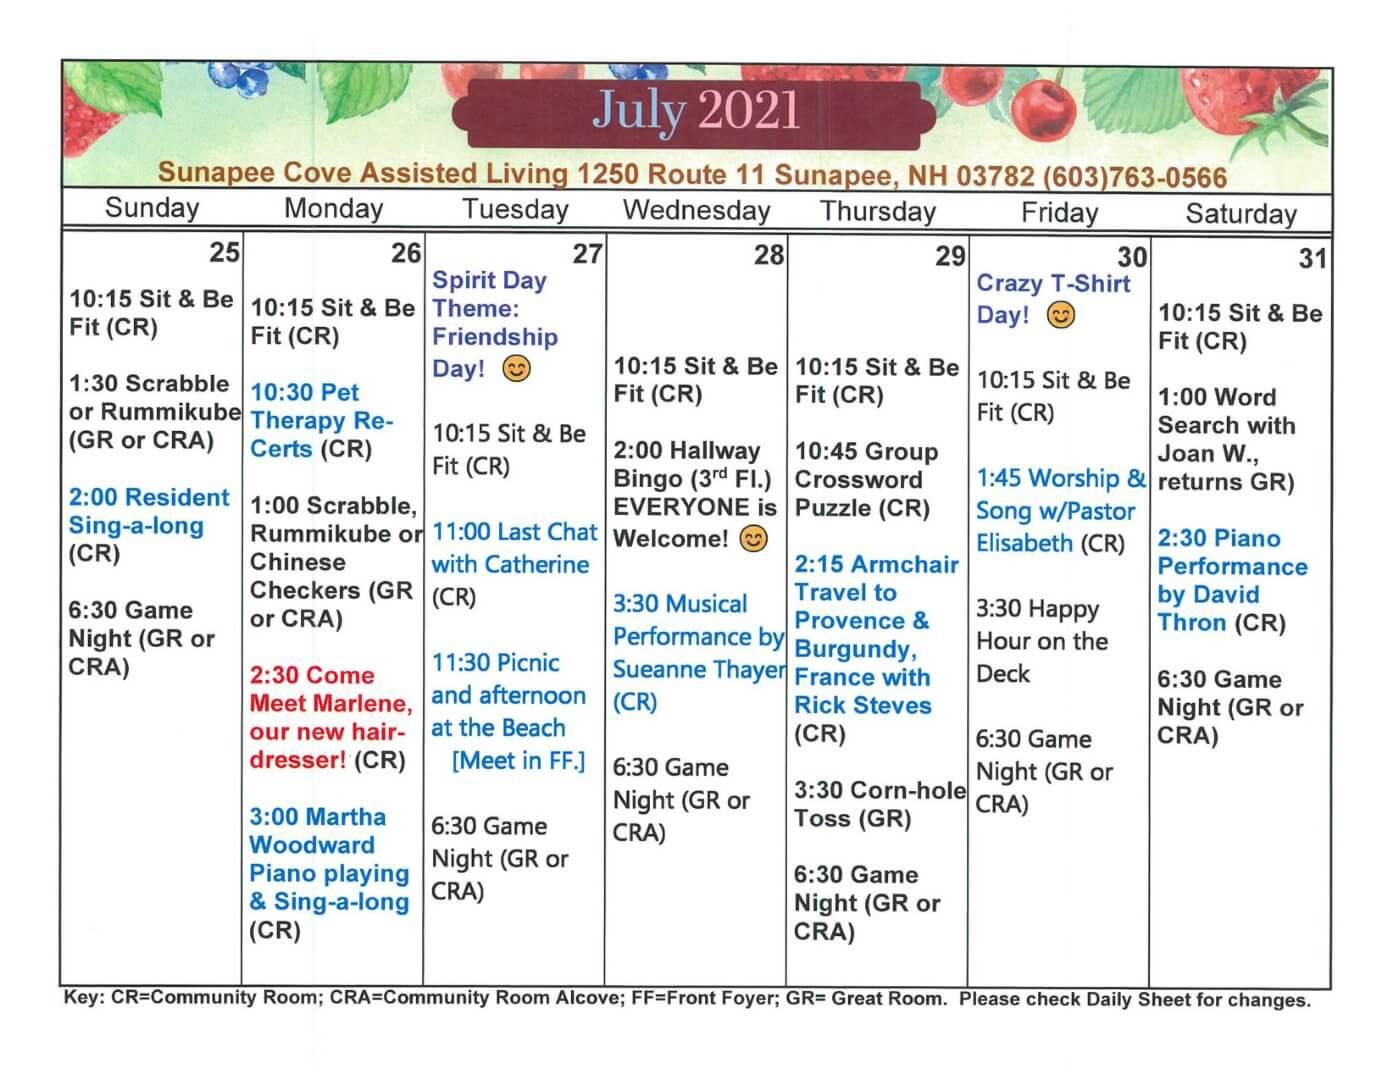 July 2021 Activity Calendar - 25-31